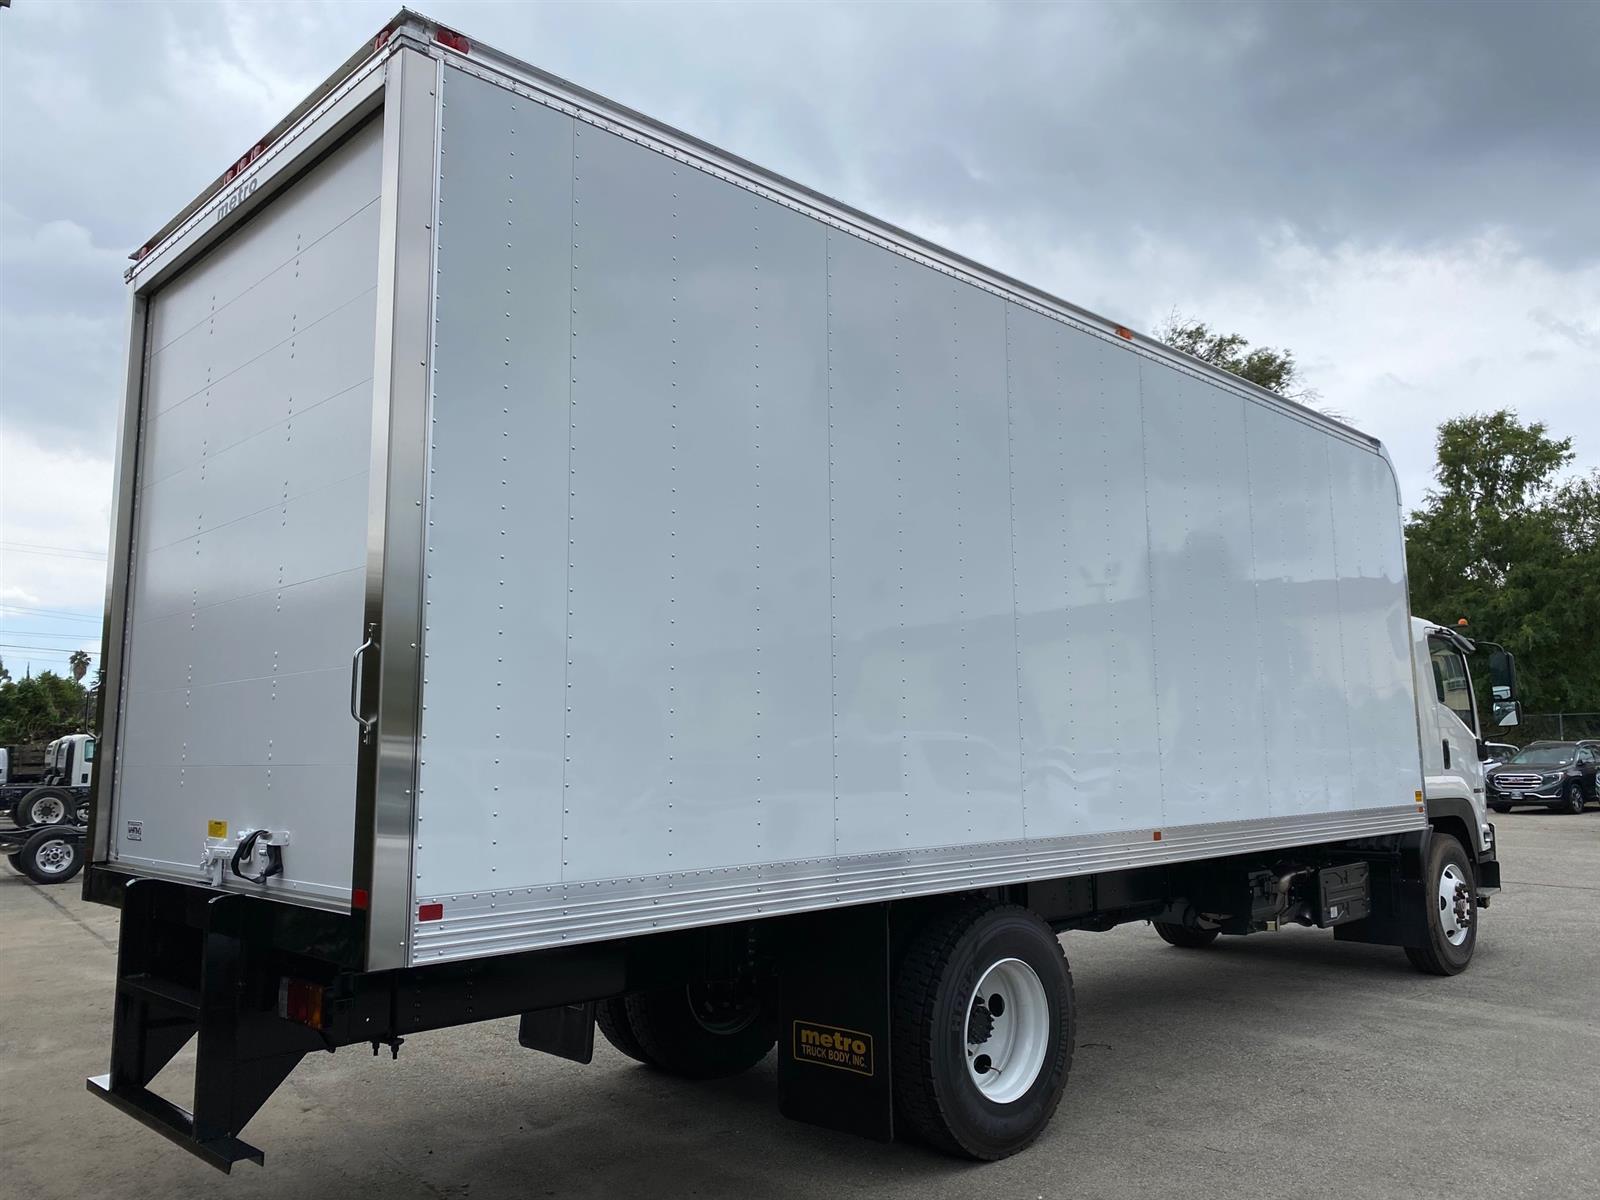 2020 Isuzu FTR Regular Cab 4x2, 26' Aluminum Van Body #T49293 - photo 1